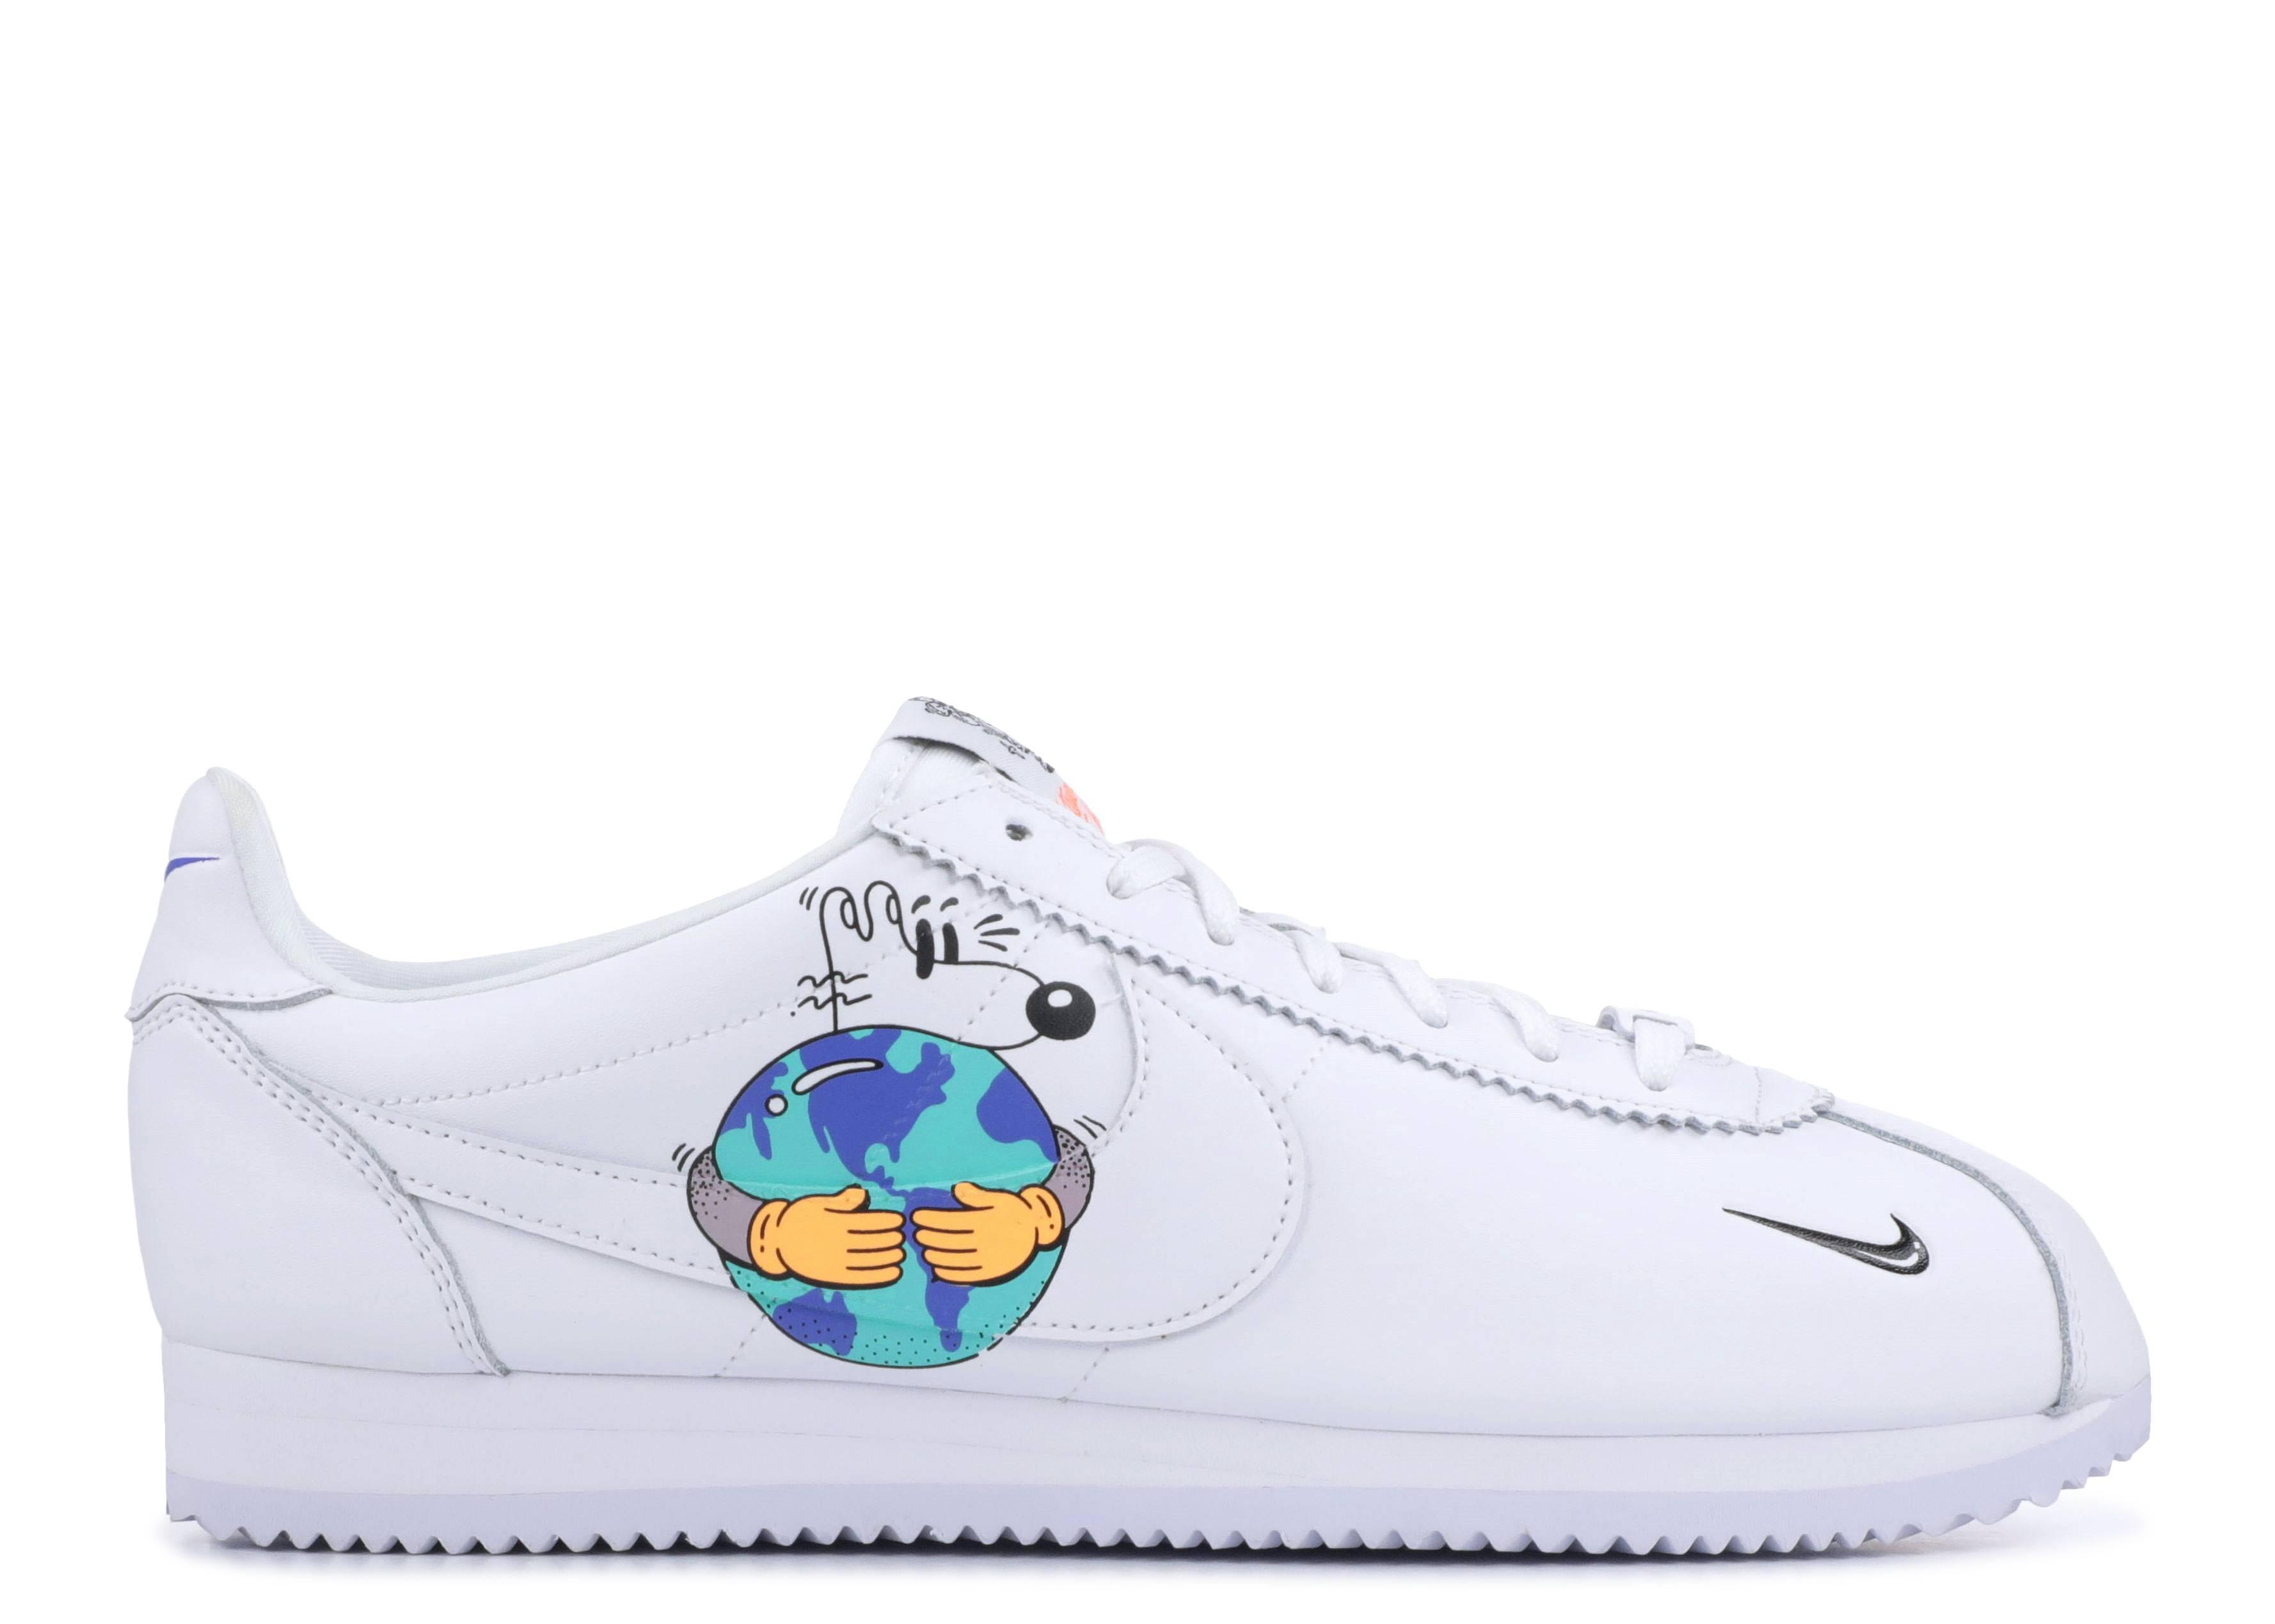 cerca misil Envío  Steve Harrington X Cortez Flyleather QS 'Earth Day' - Nike - CI5548 100 -  white/hyper crimson-melon tint-black | Flight Club